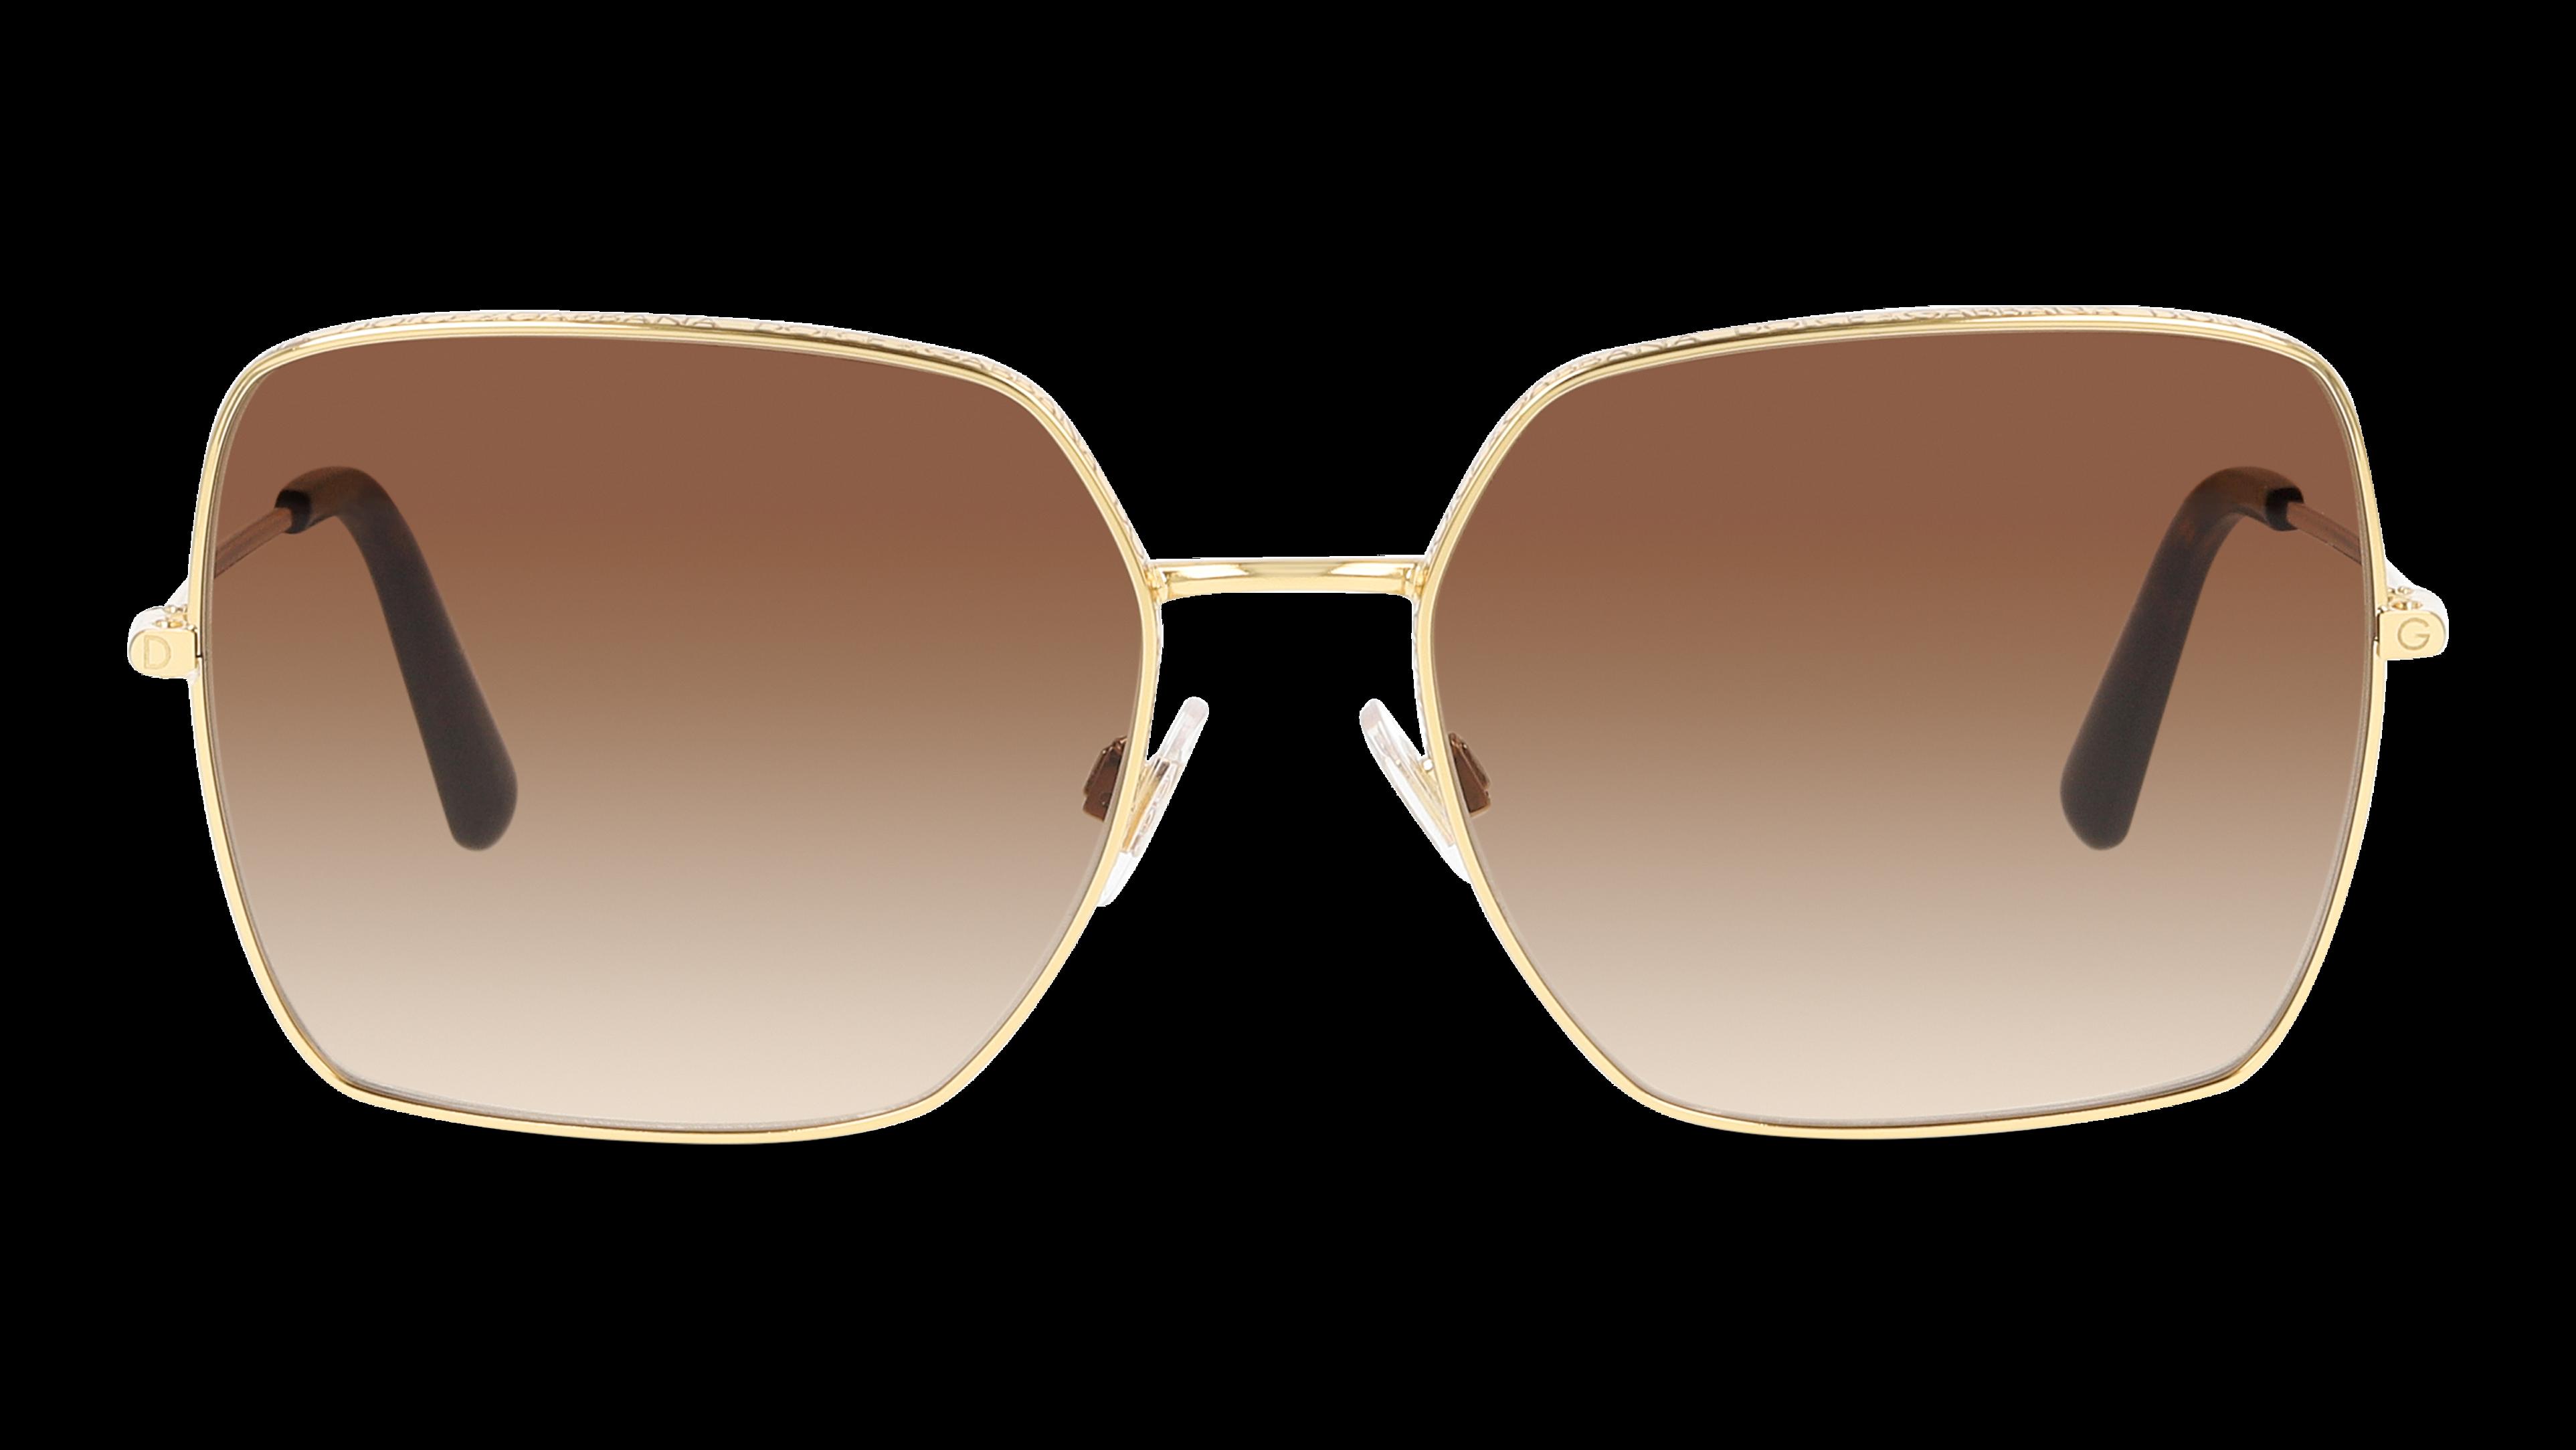 Front Dolce & Gabbana DolceGab 2242 41306 57/16 Oro/Marrone